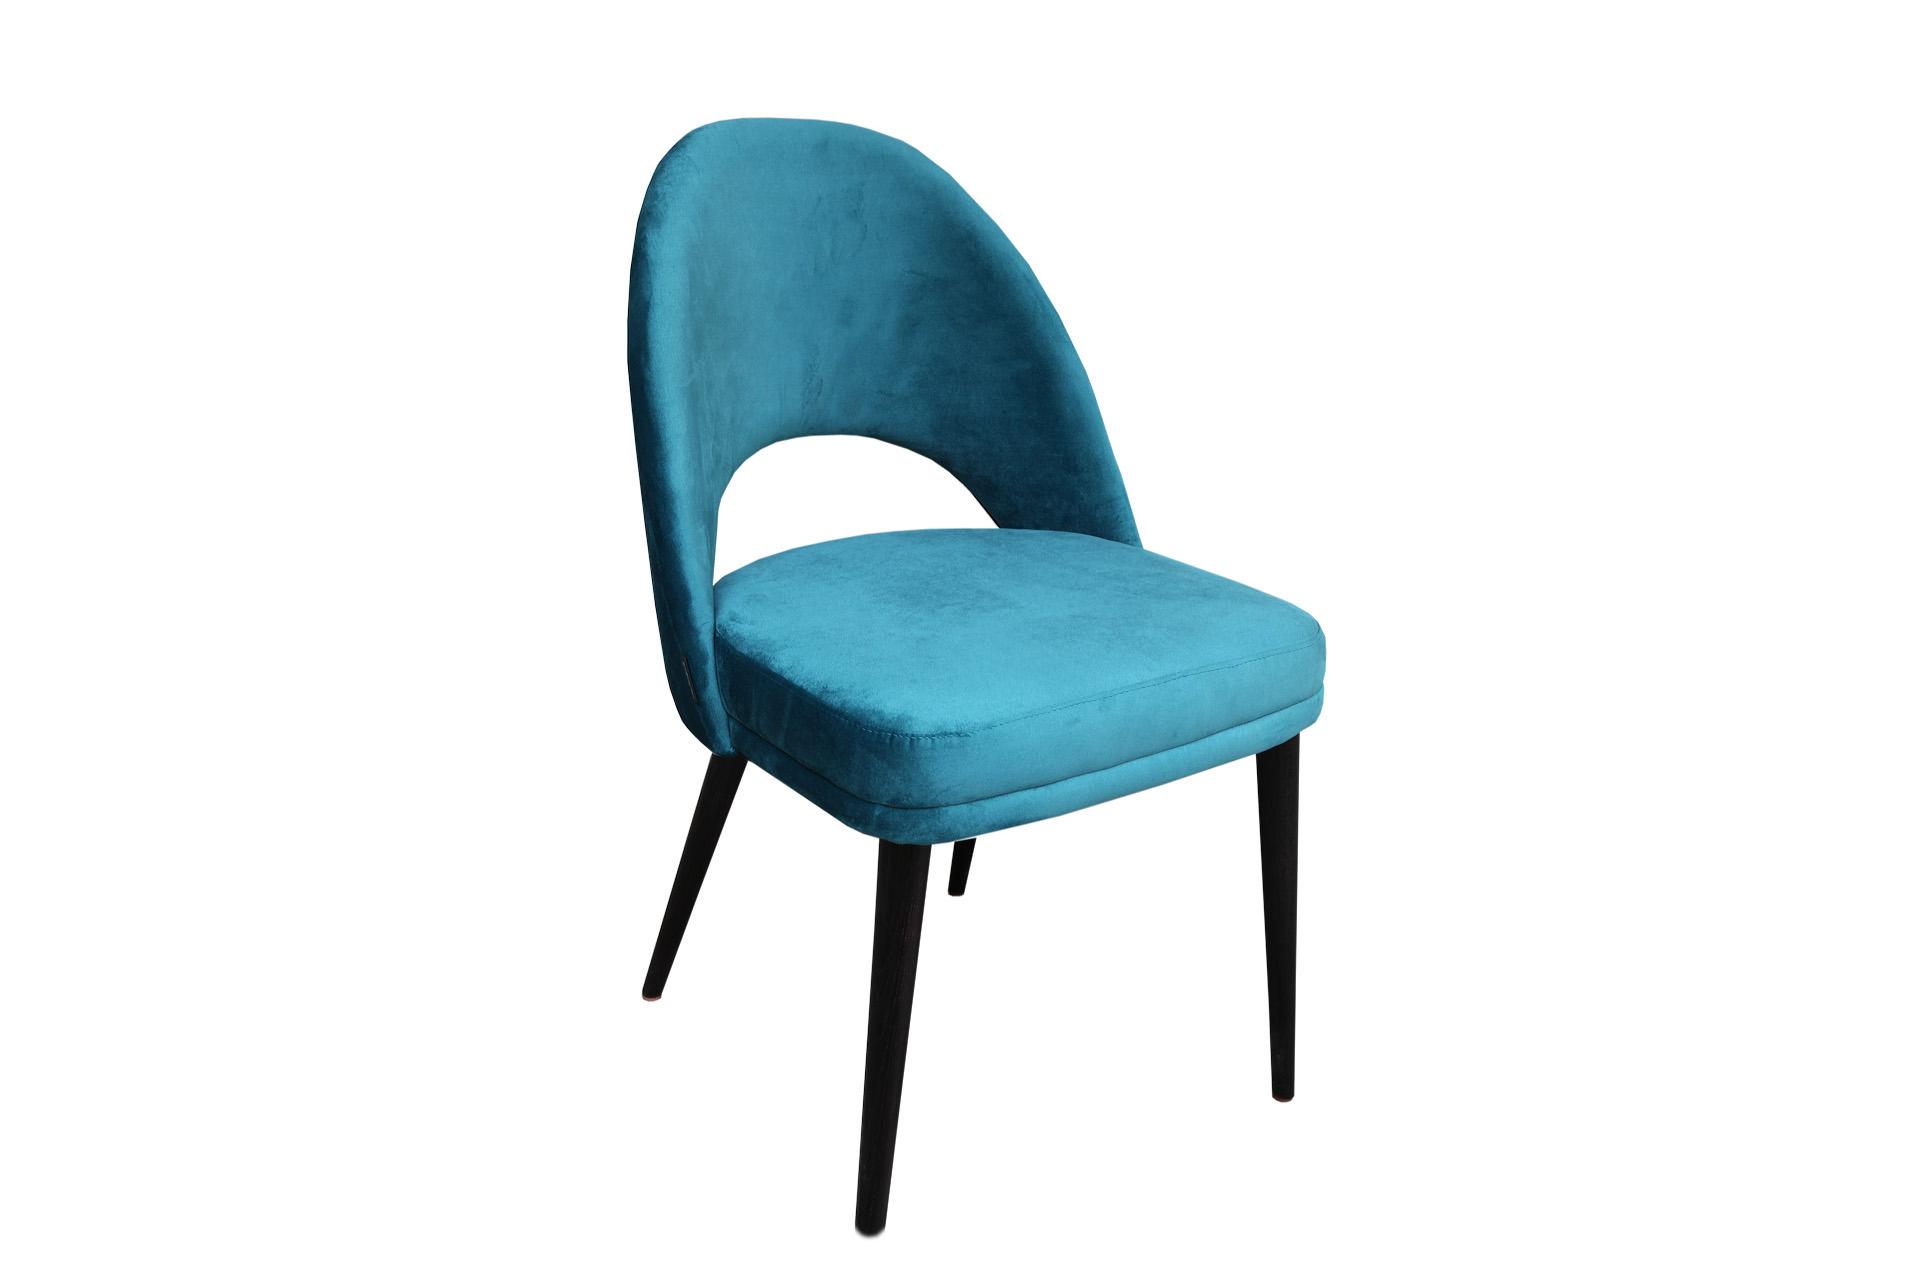 Moderne sofa stoel retro vintage eetkamerstoelen